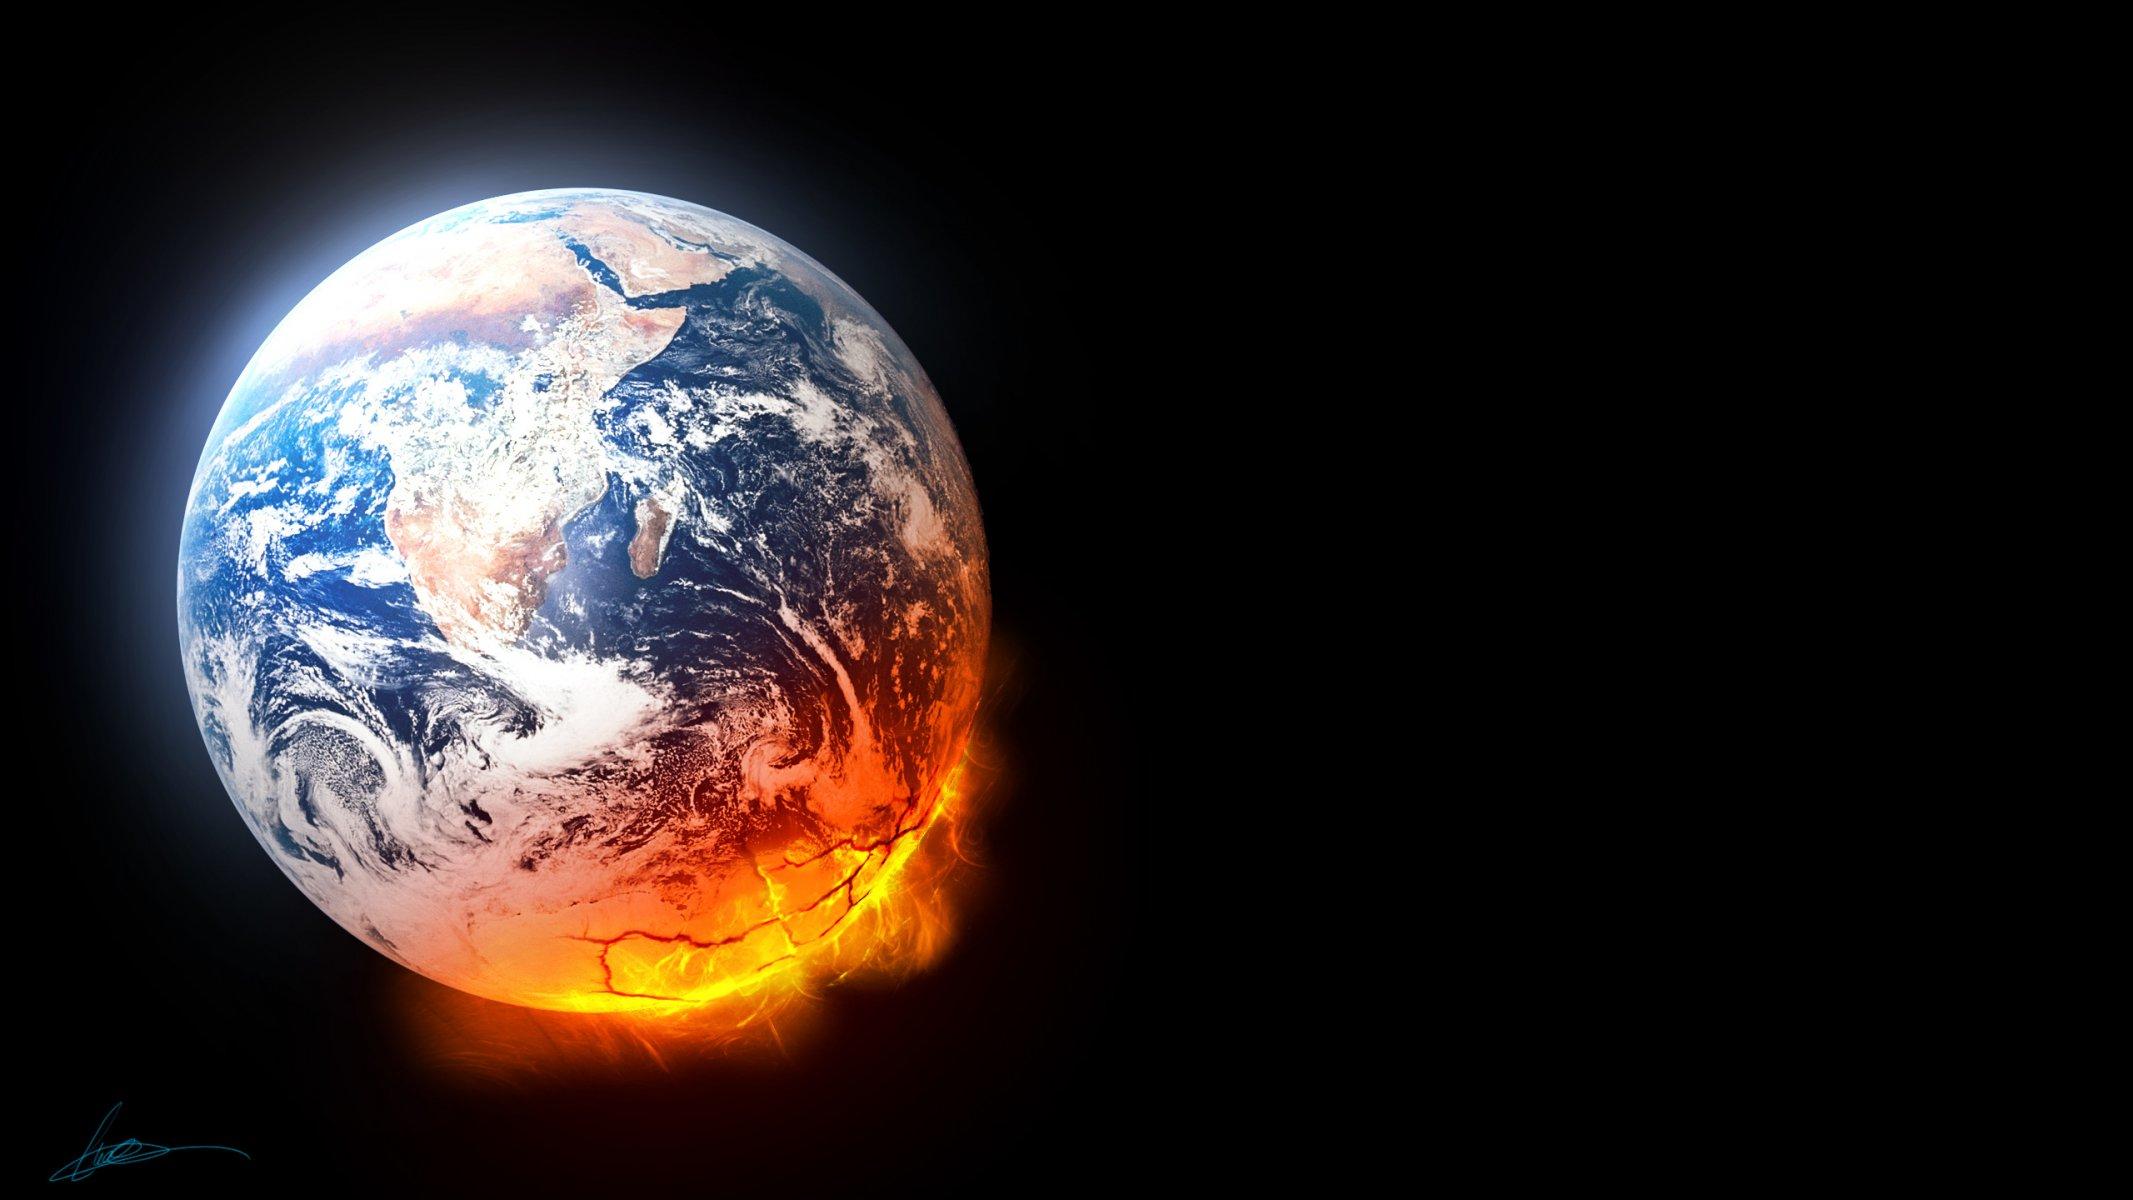 картинки про планету землю даче фистингует свою